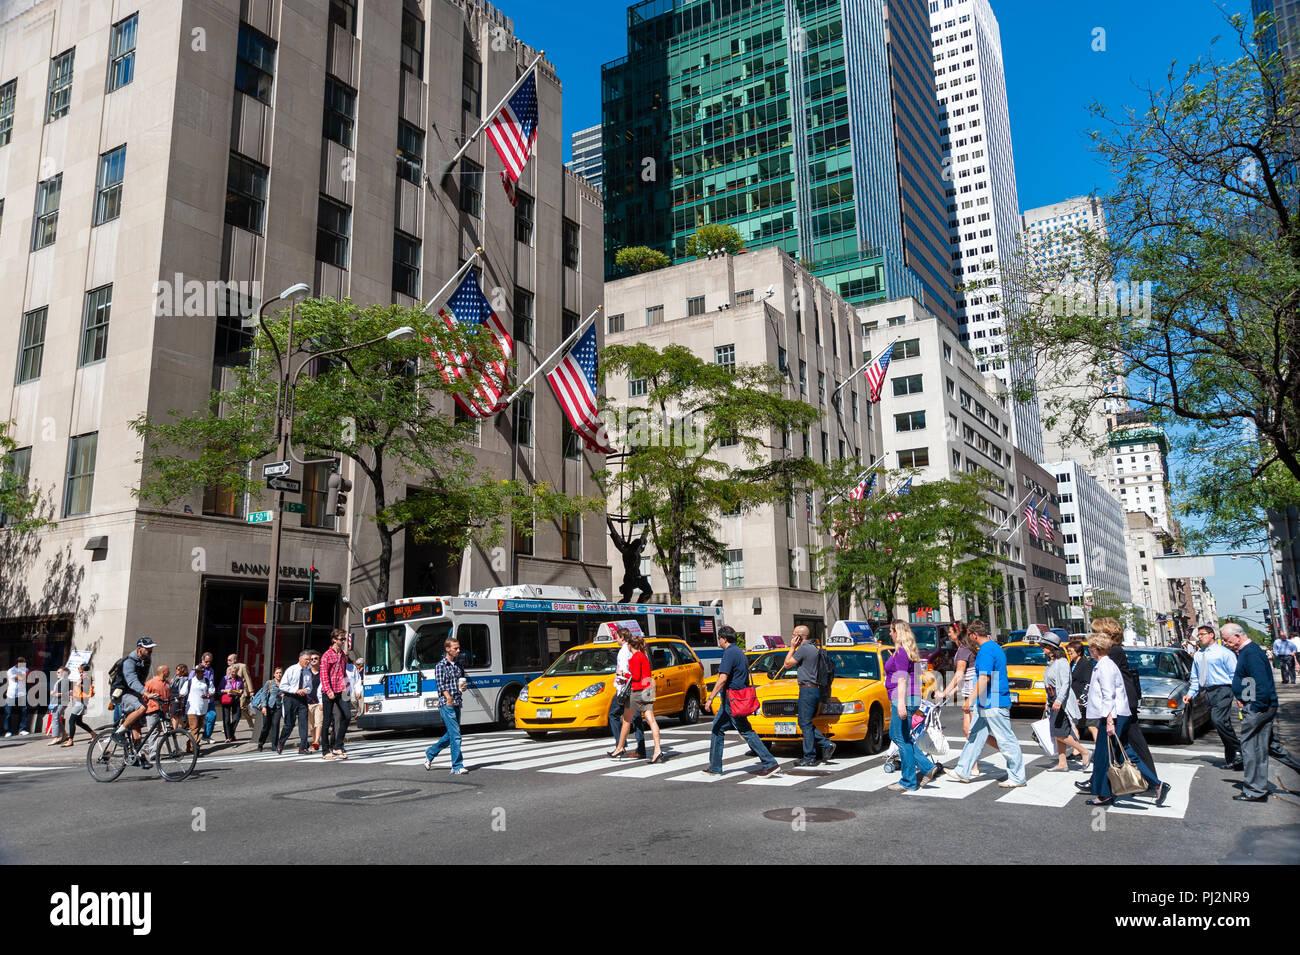 Busy city street crossing on Fifth Avenue, New York City, America, USA Stock Photo